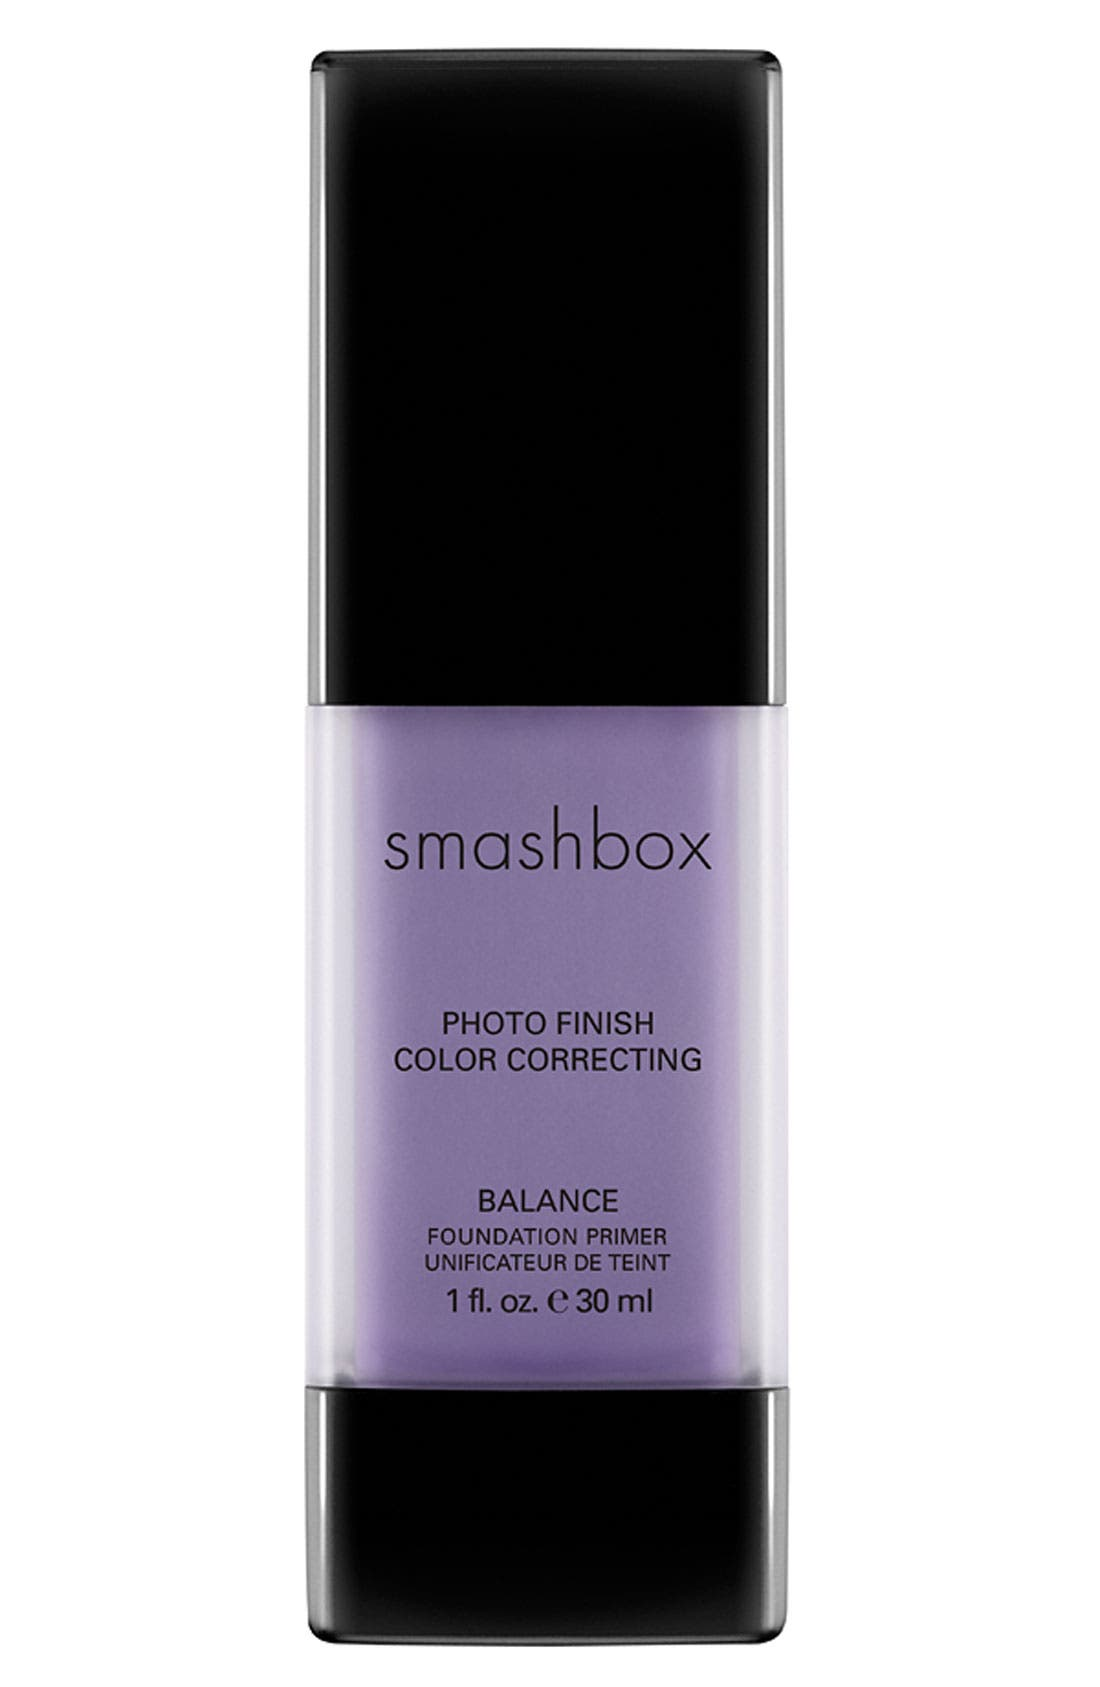 Smashbox Photo Finish Color Correcting Foundation Primer Nordstrom